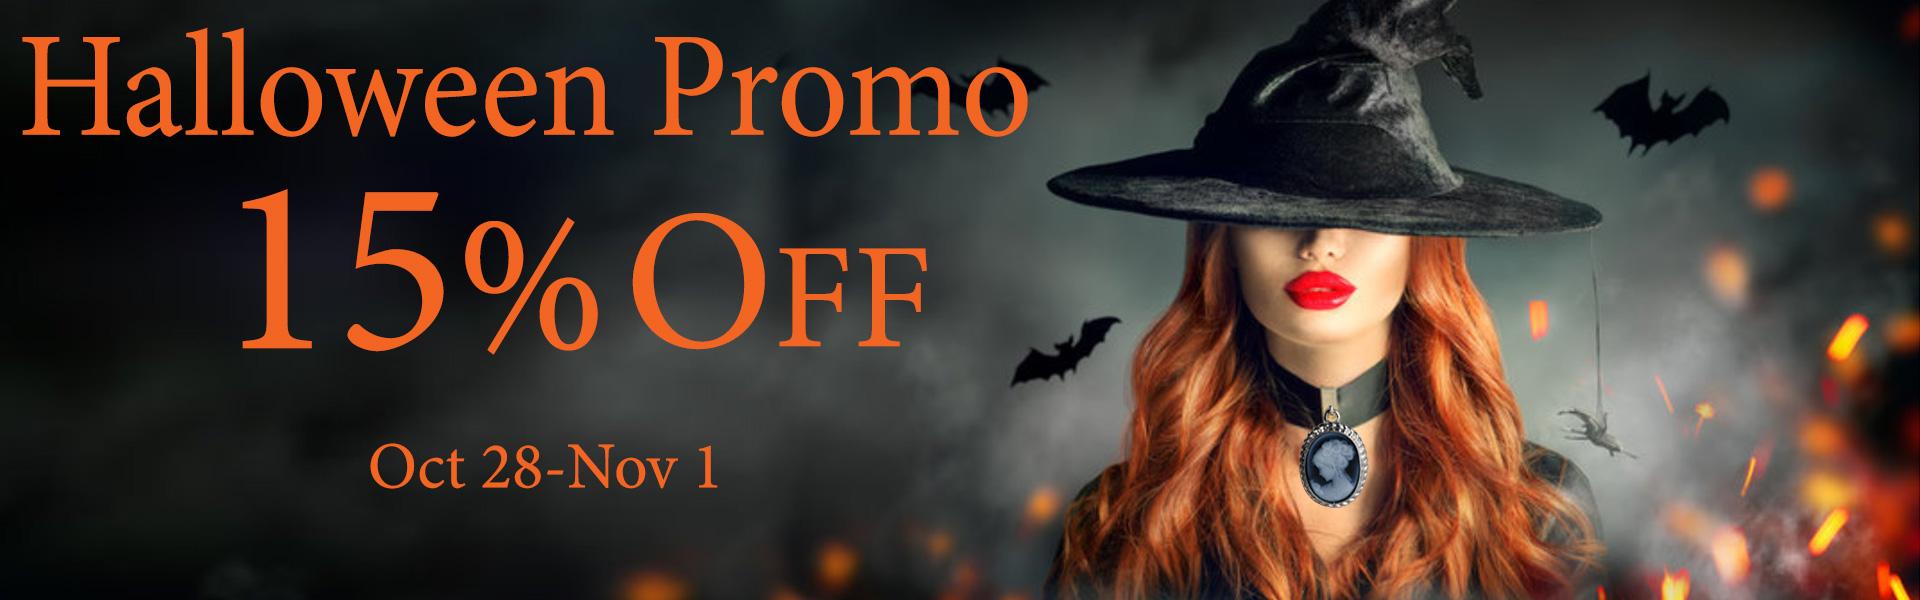 Halloween promo